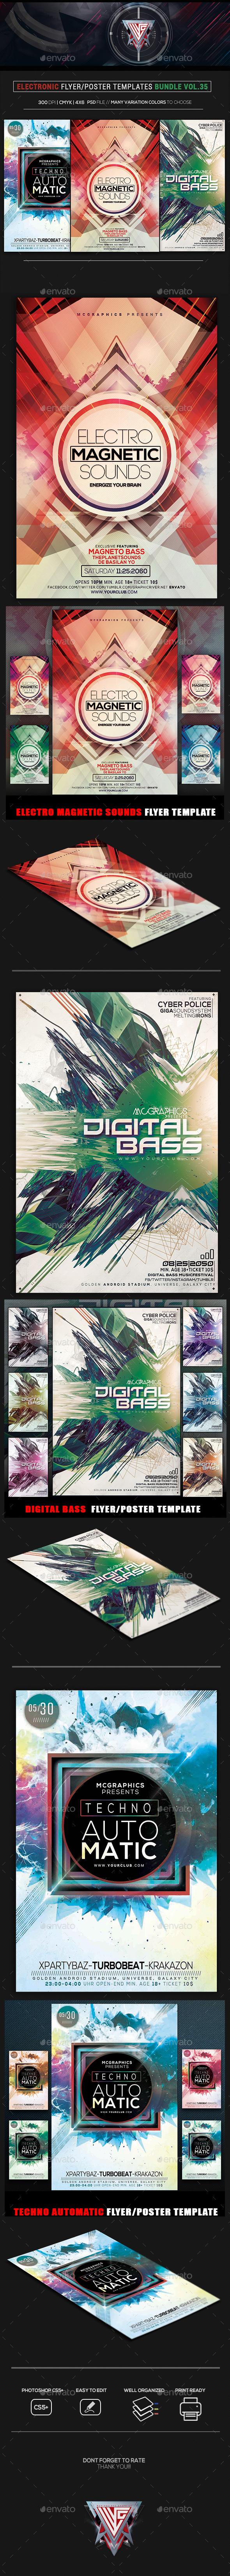 Electro Music Flyer Bundle Vol. 35 - Flyers Print Templates